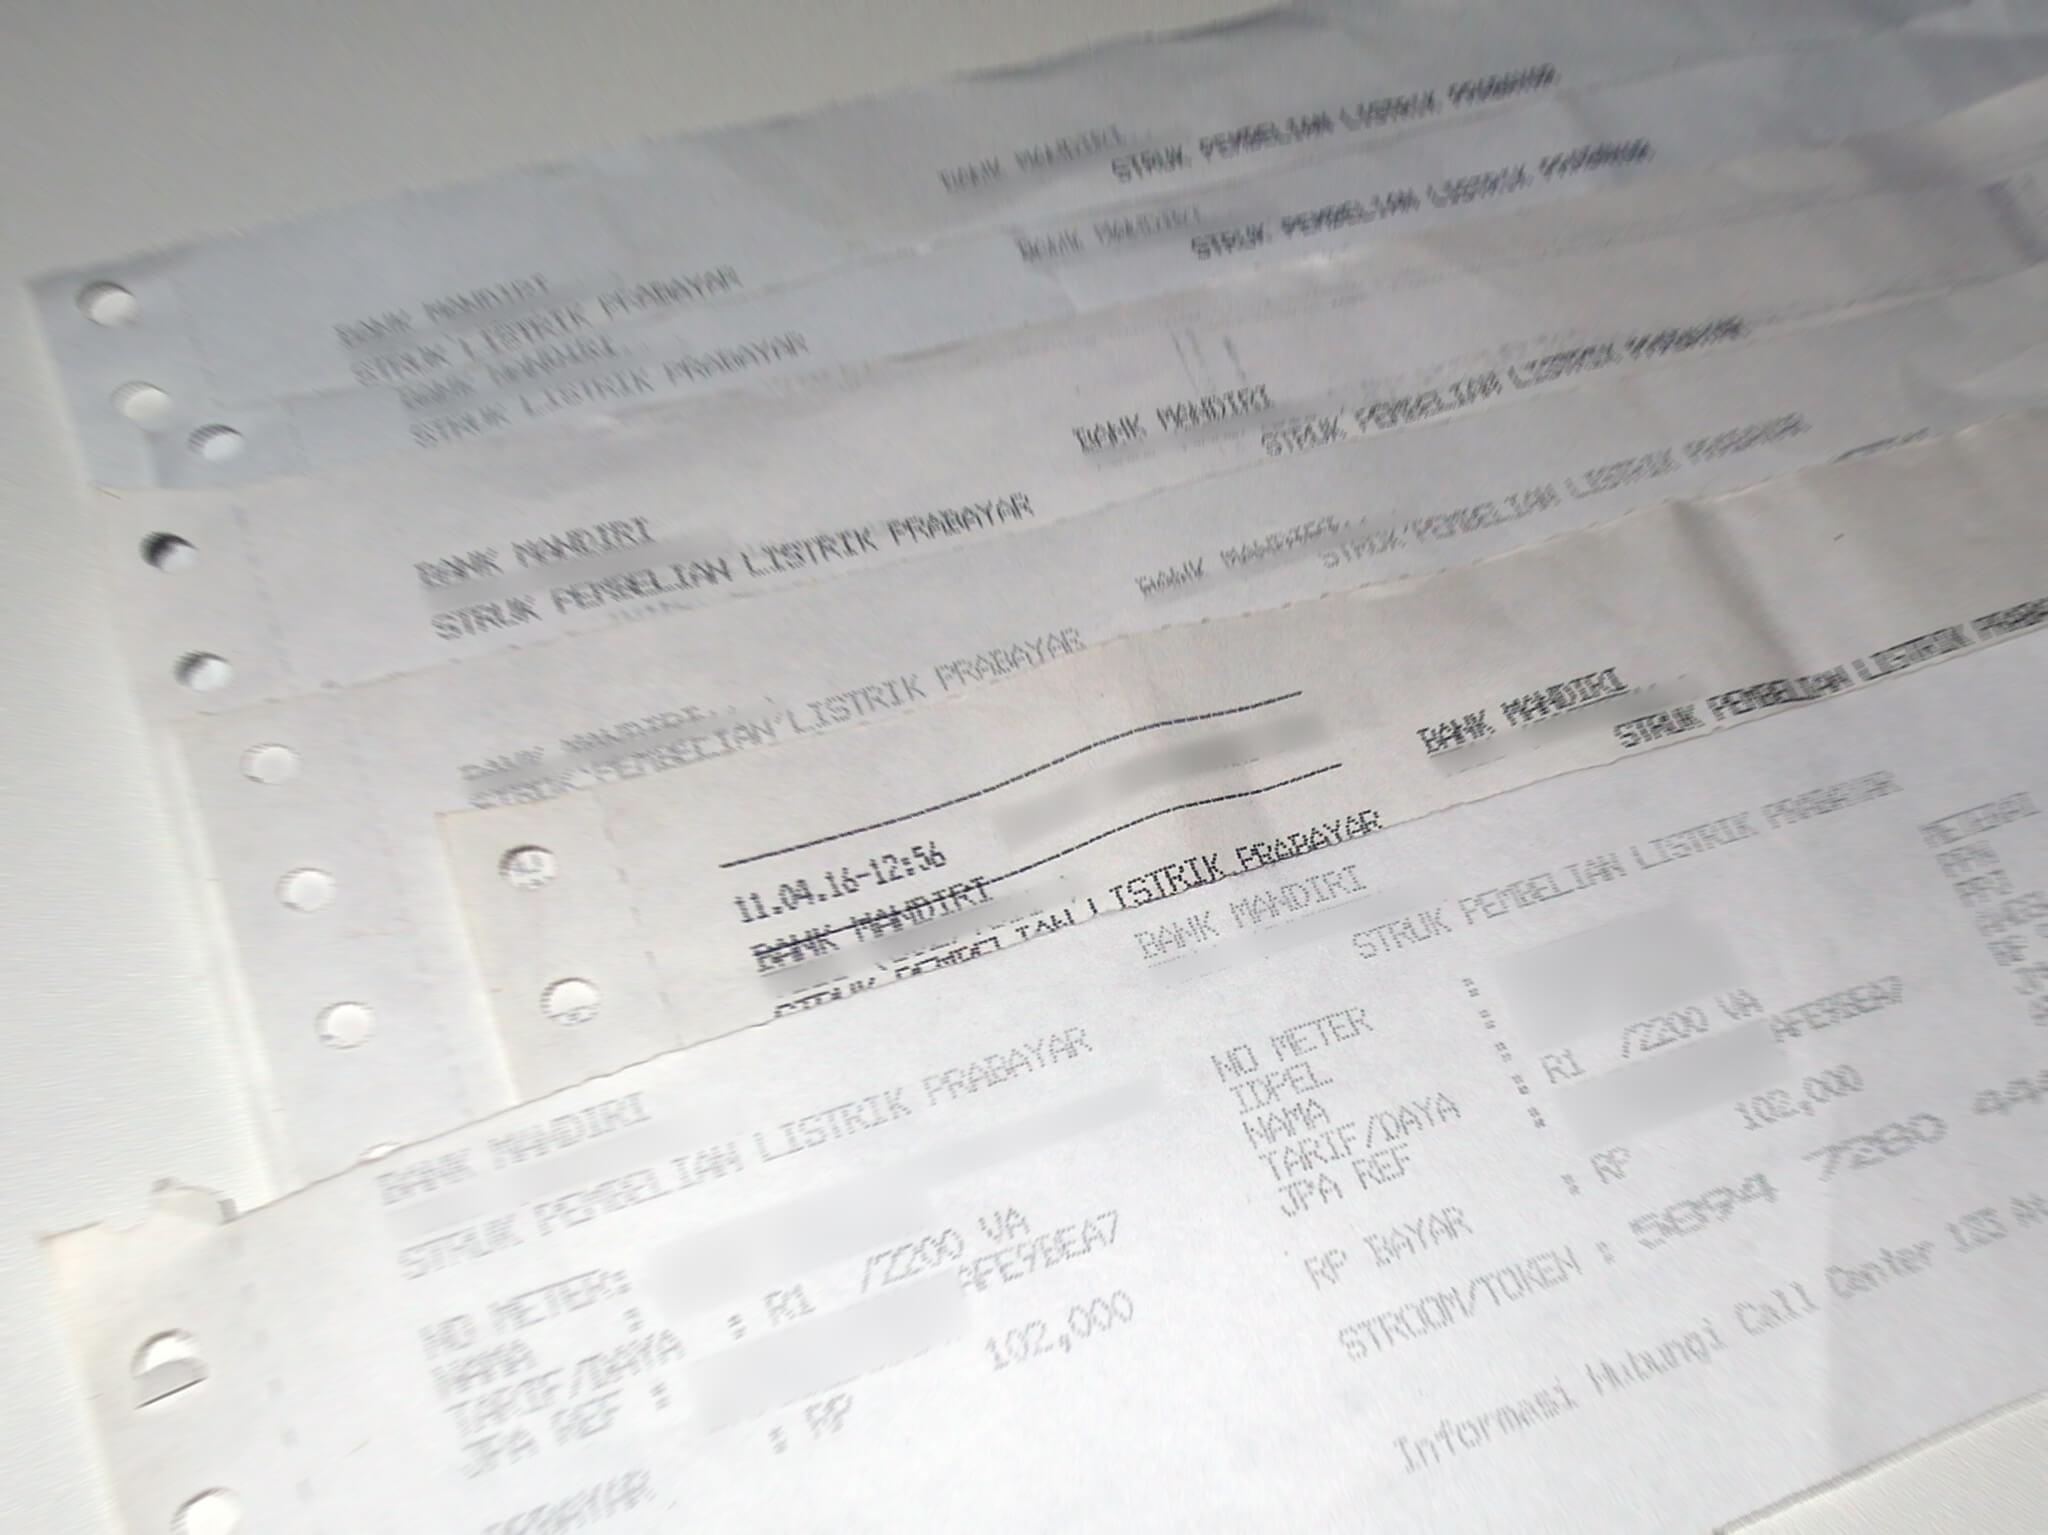 Beli Pulsa Listrik Prabayar Di Indomaret Baruu Voucher Card